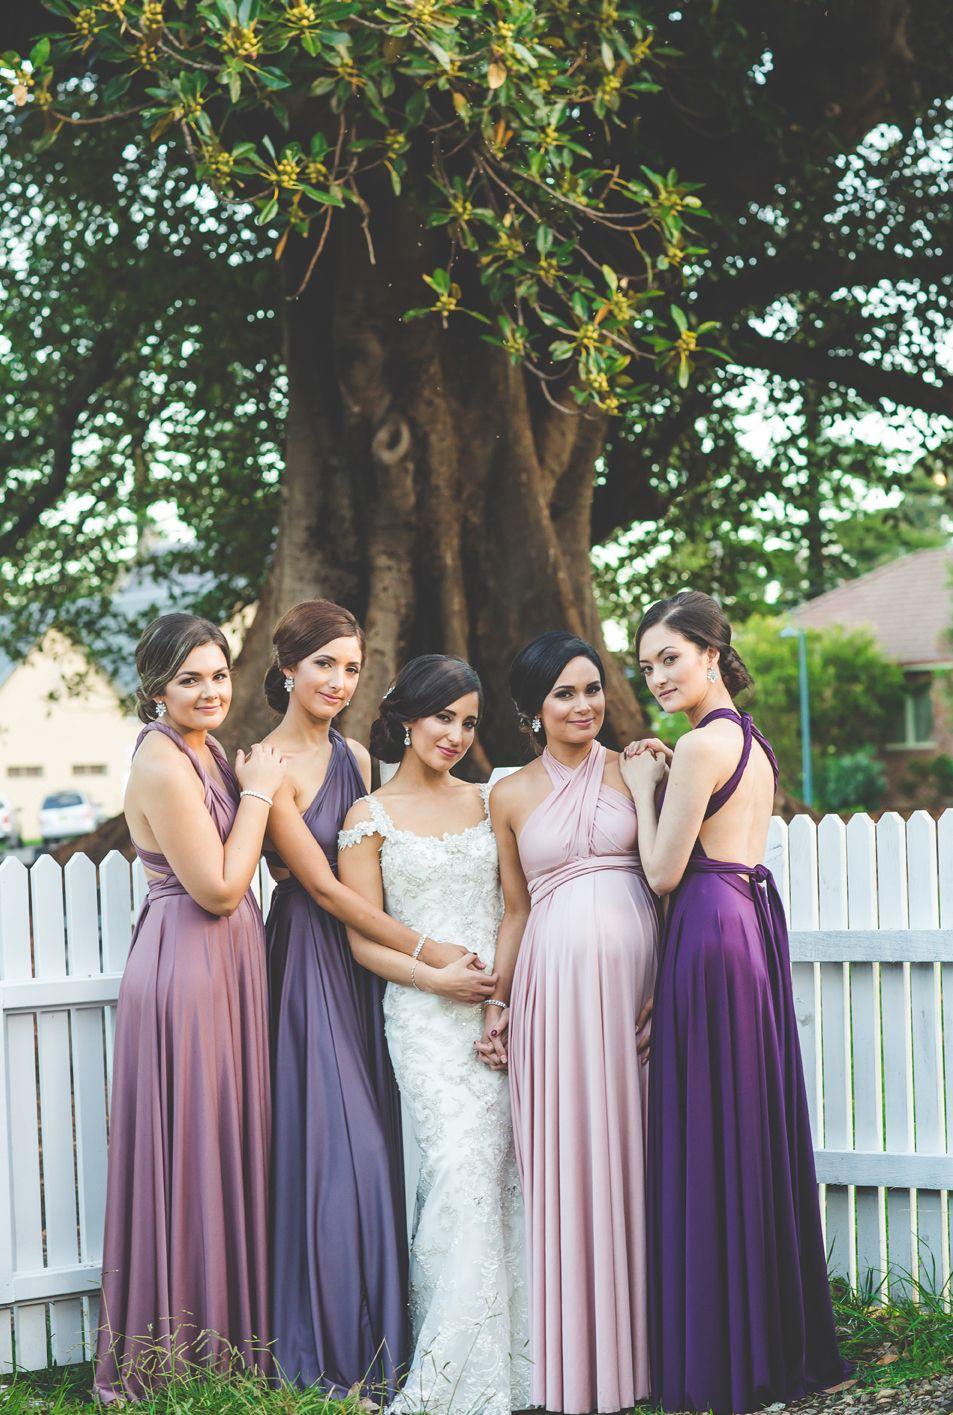 Different colour dresses for each bridesmaid love this look of different colour dresses for each bridesmaid love this look of goddess by nature signature multiway ombrellifo Choice Image